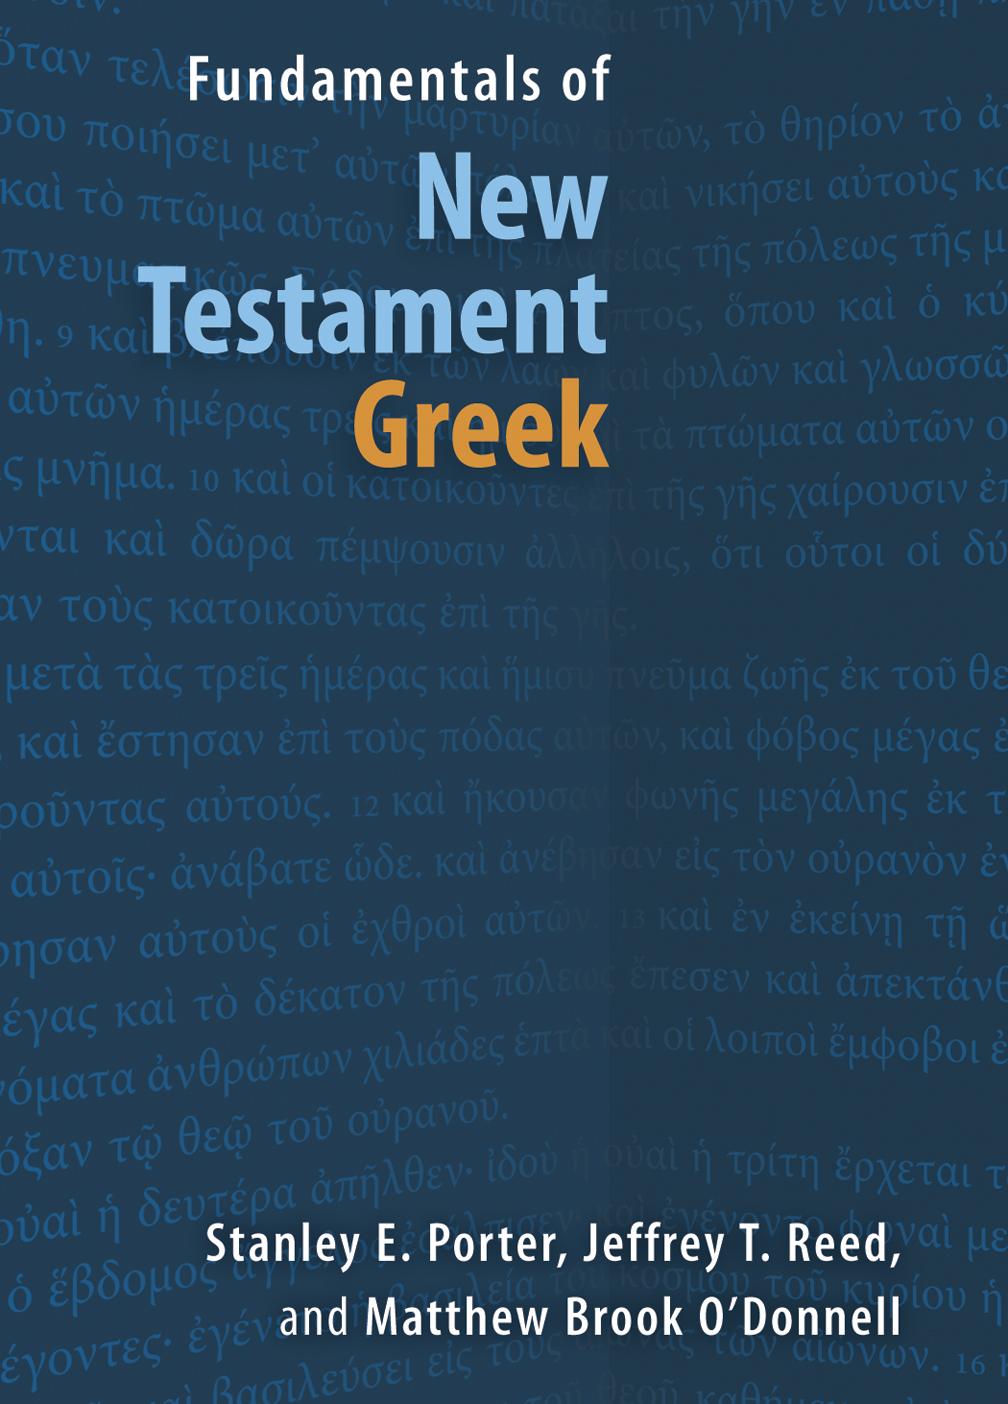 Fundamentals of New Testament Greek